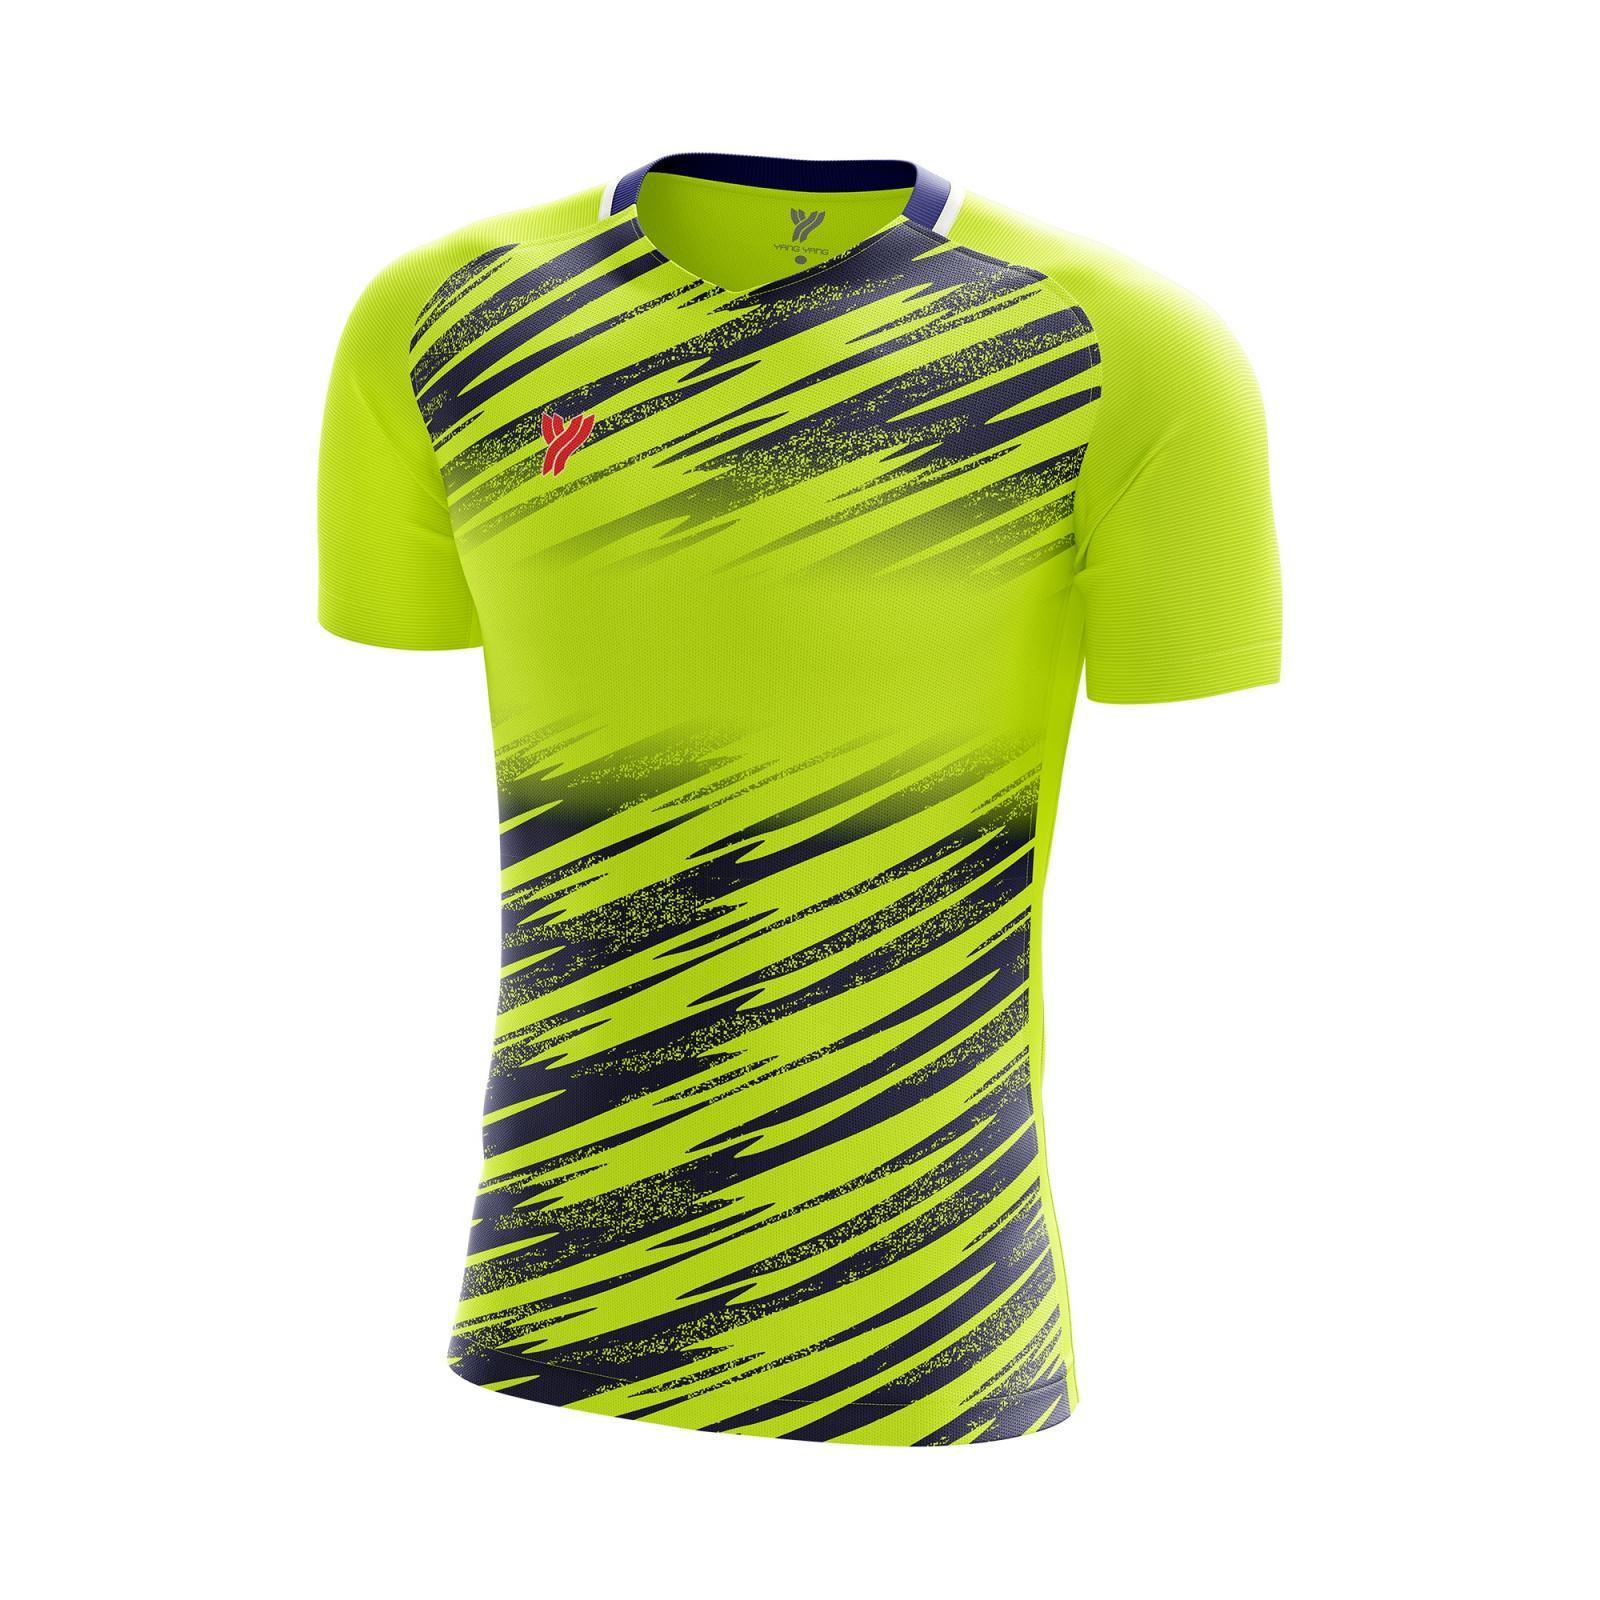 https://www.badec.store/produkty_img/badmintonove-tricko1570116443L.jpg